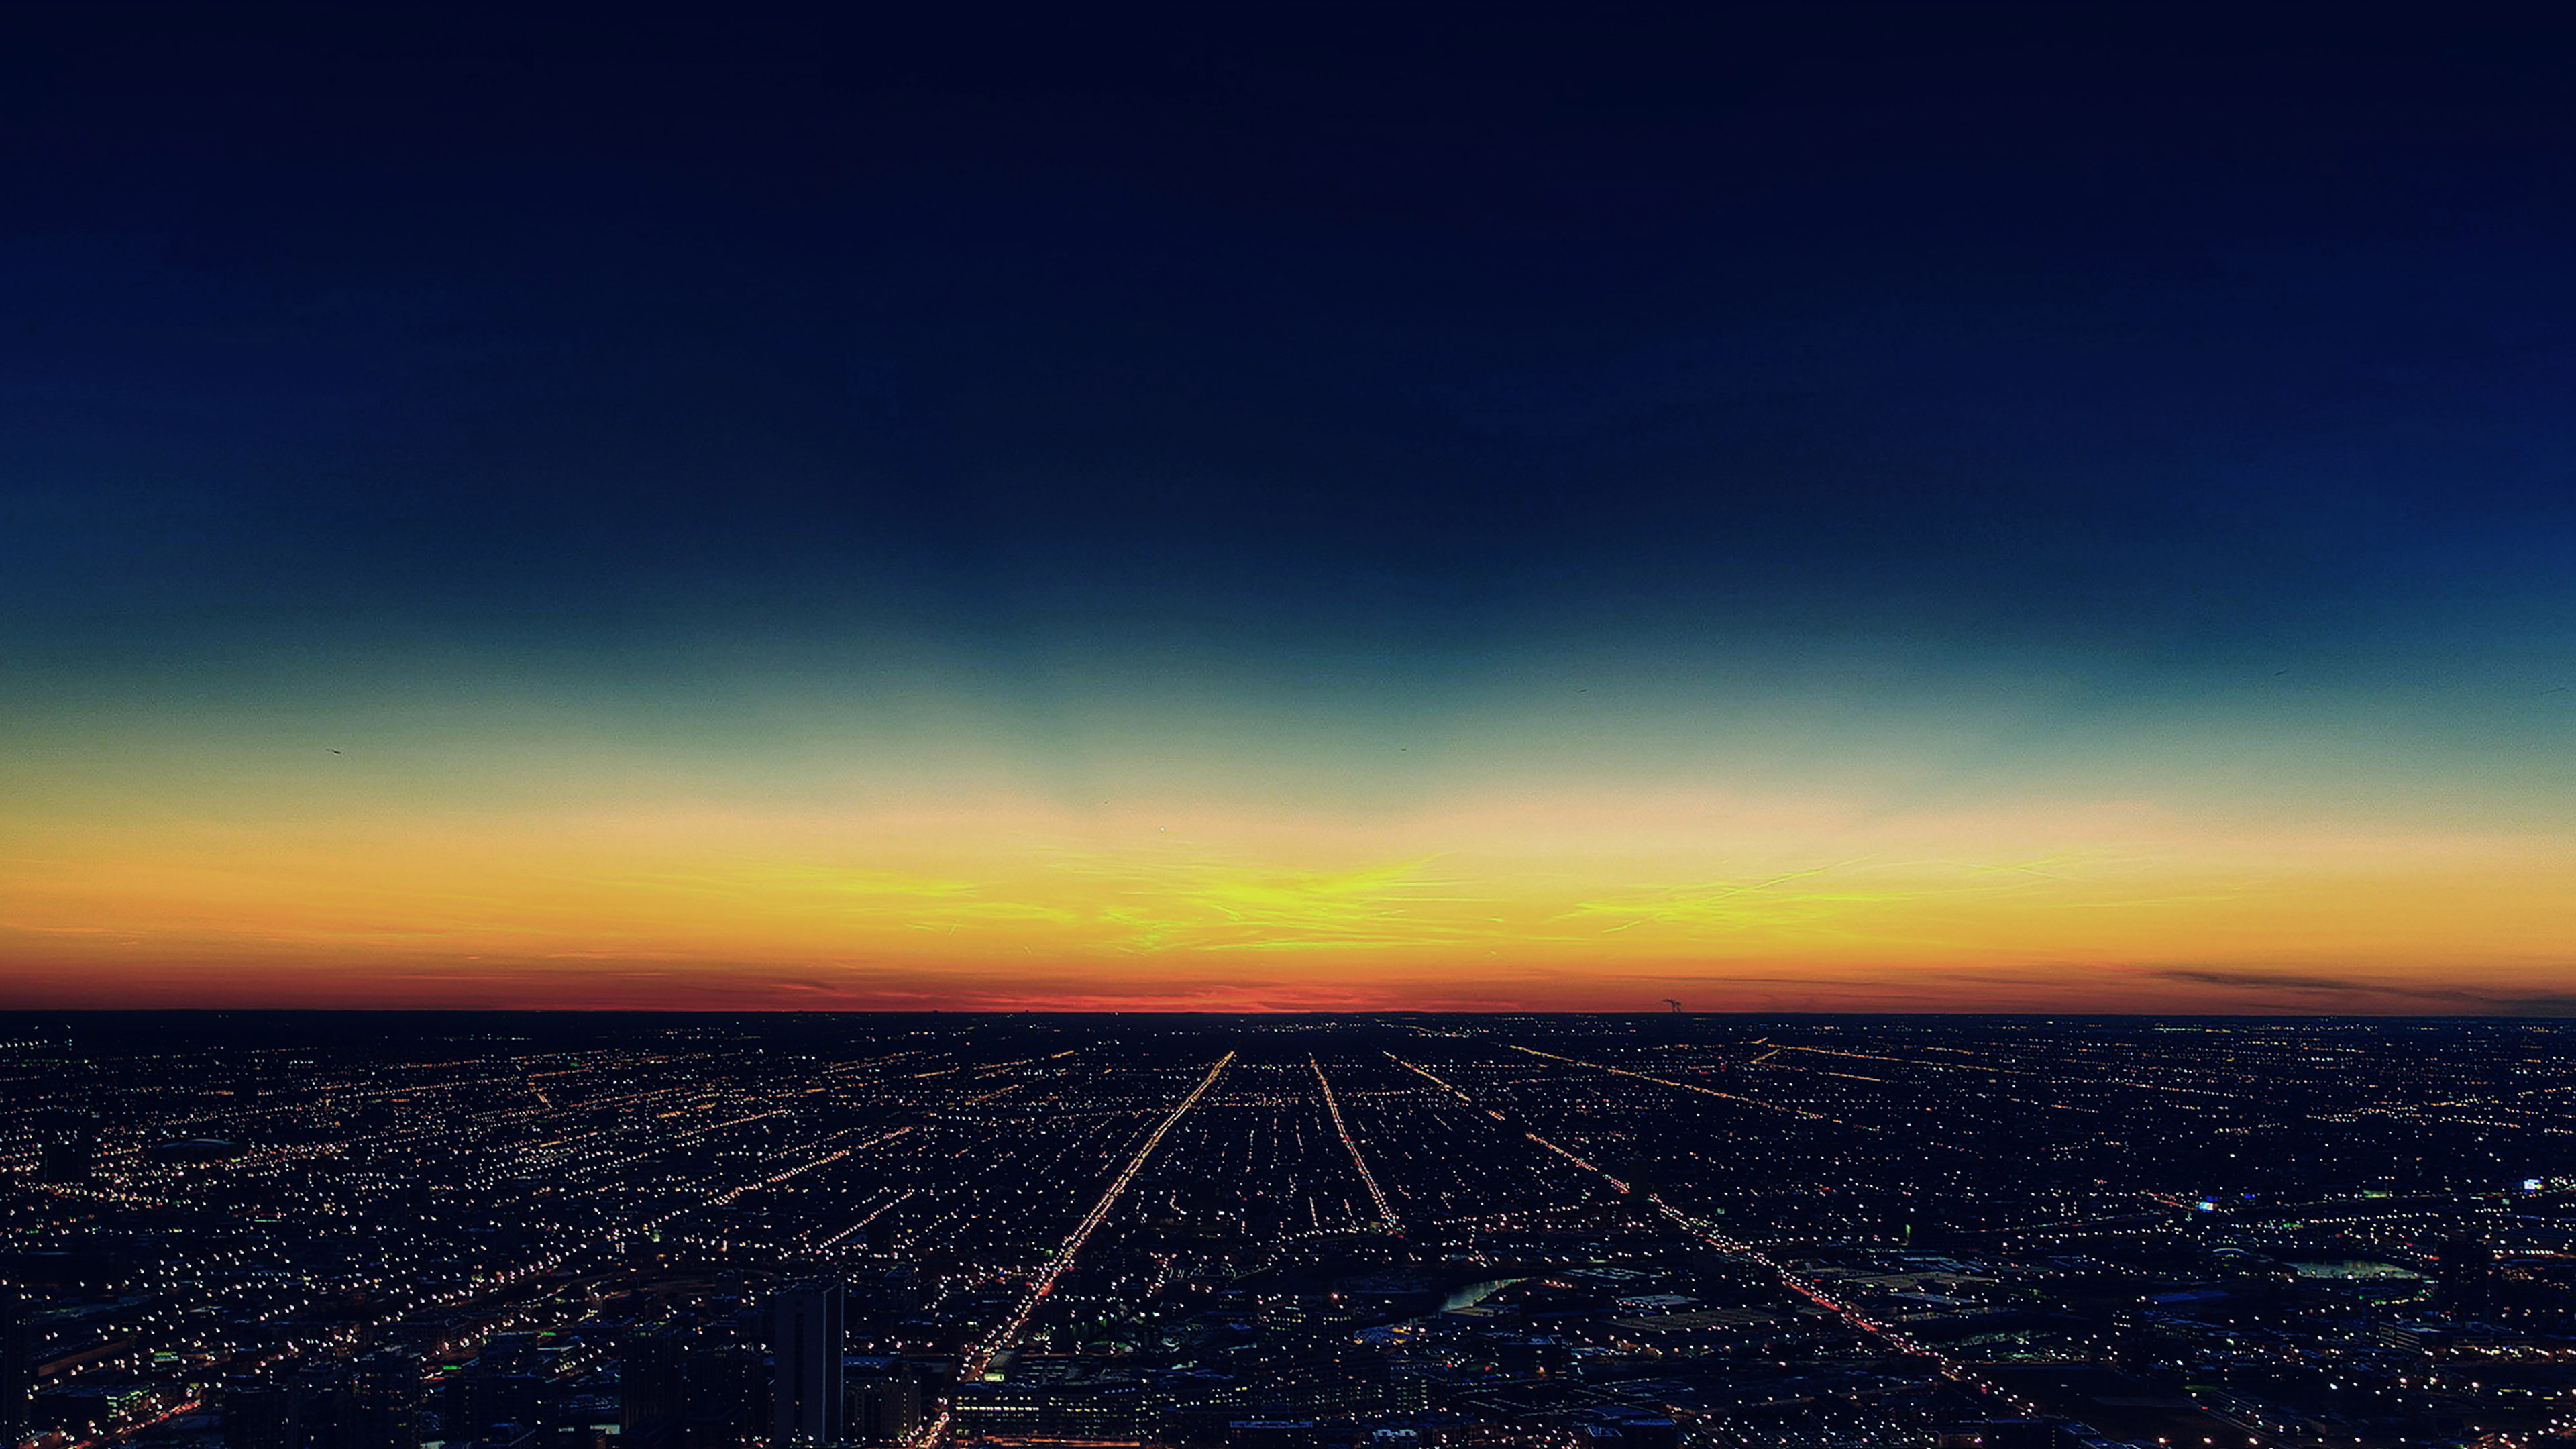 Mg31 Night Sky Flying Blue Sunset City Wallpaper